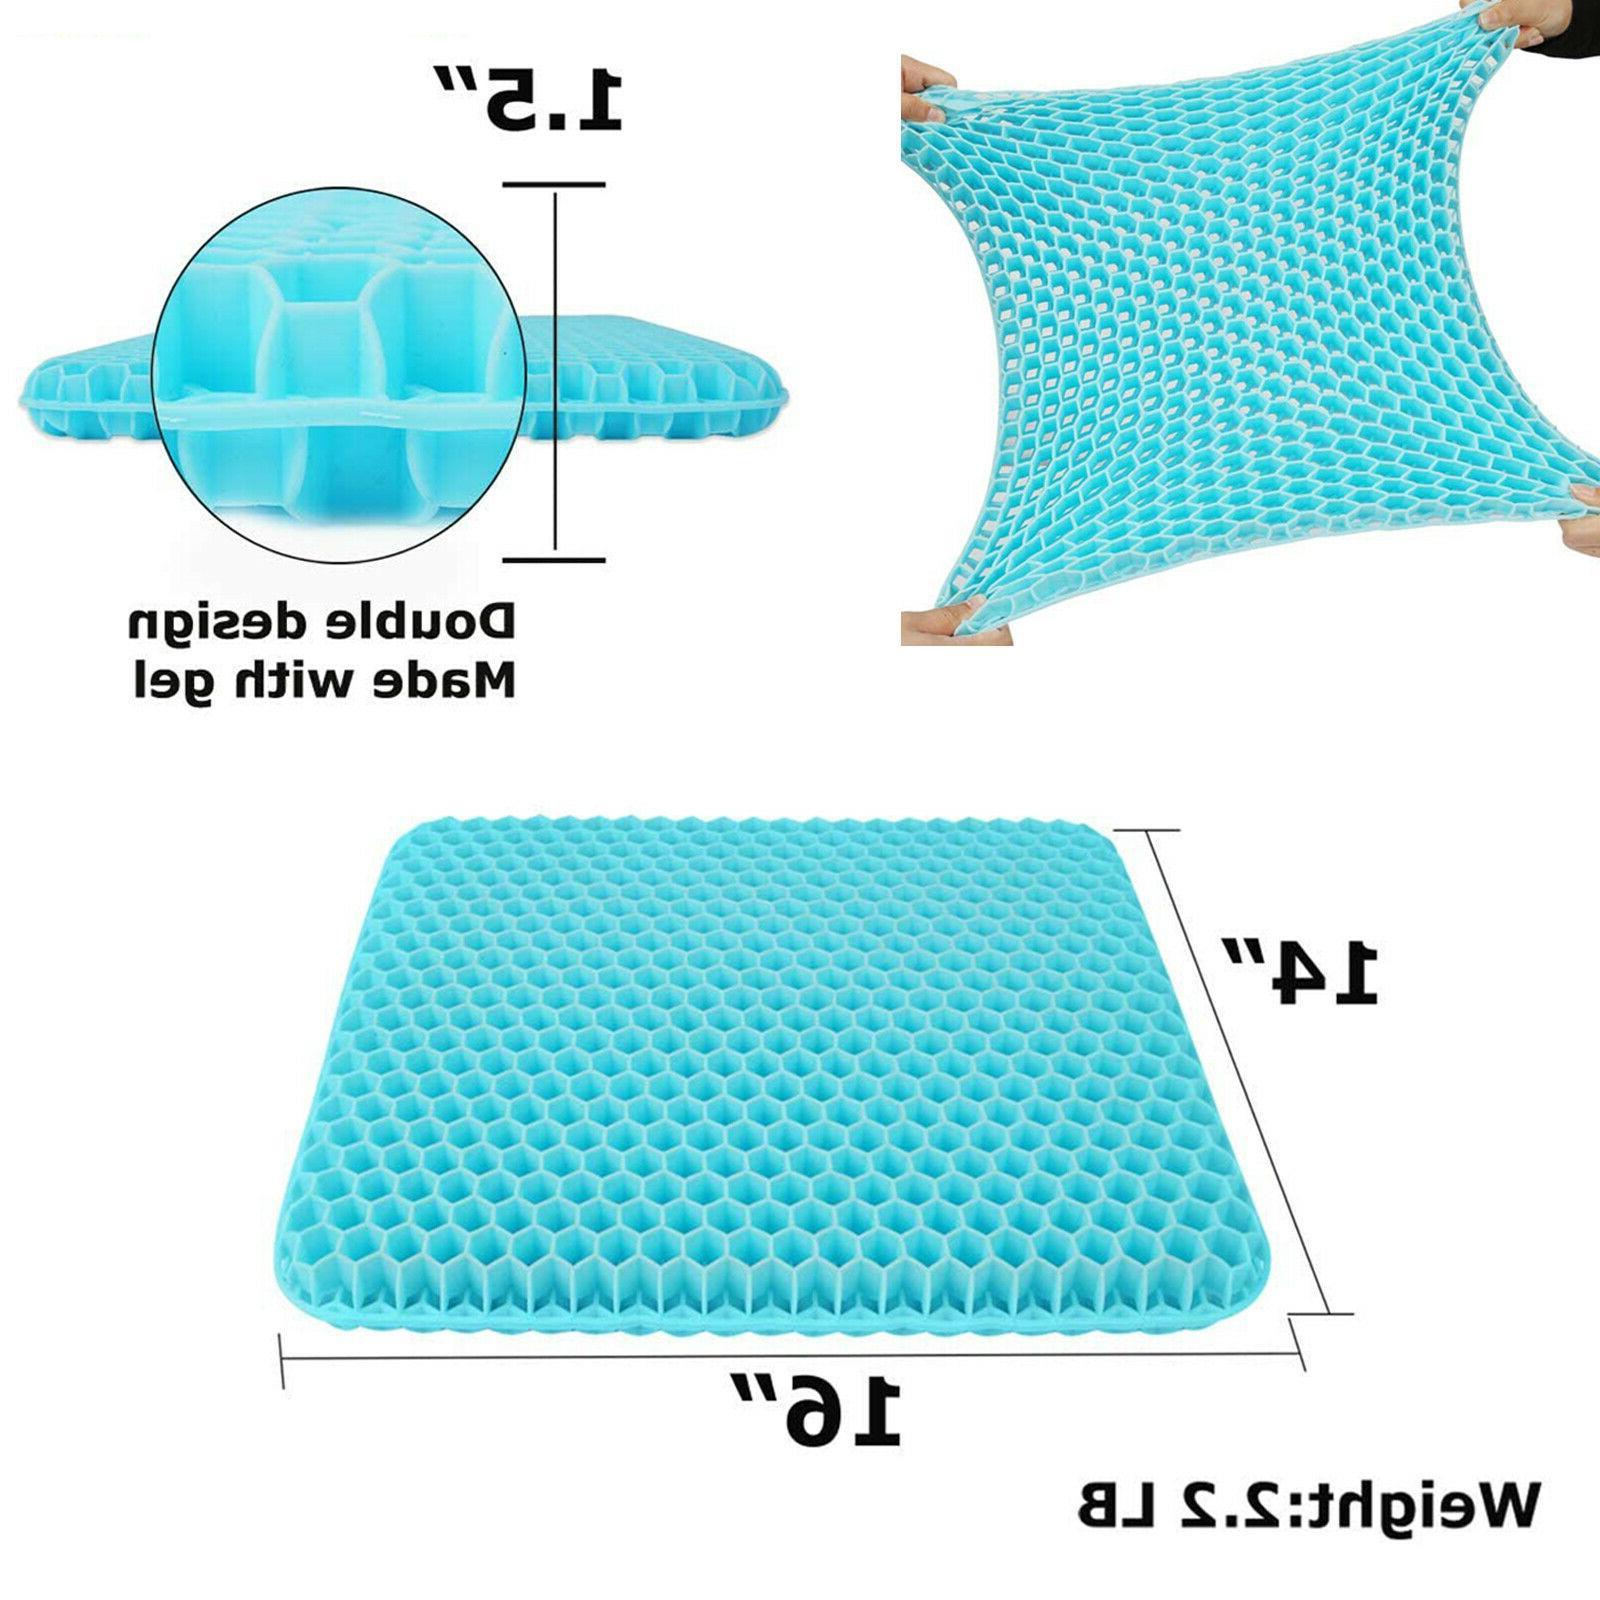 Double Seat Cushion Sitter Pillow,Non-Slip